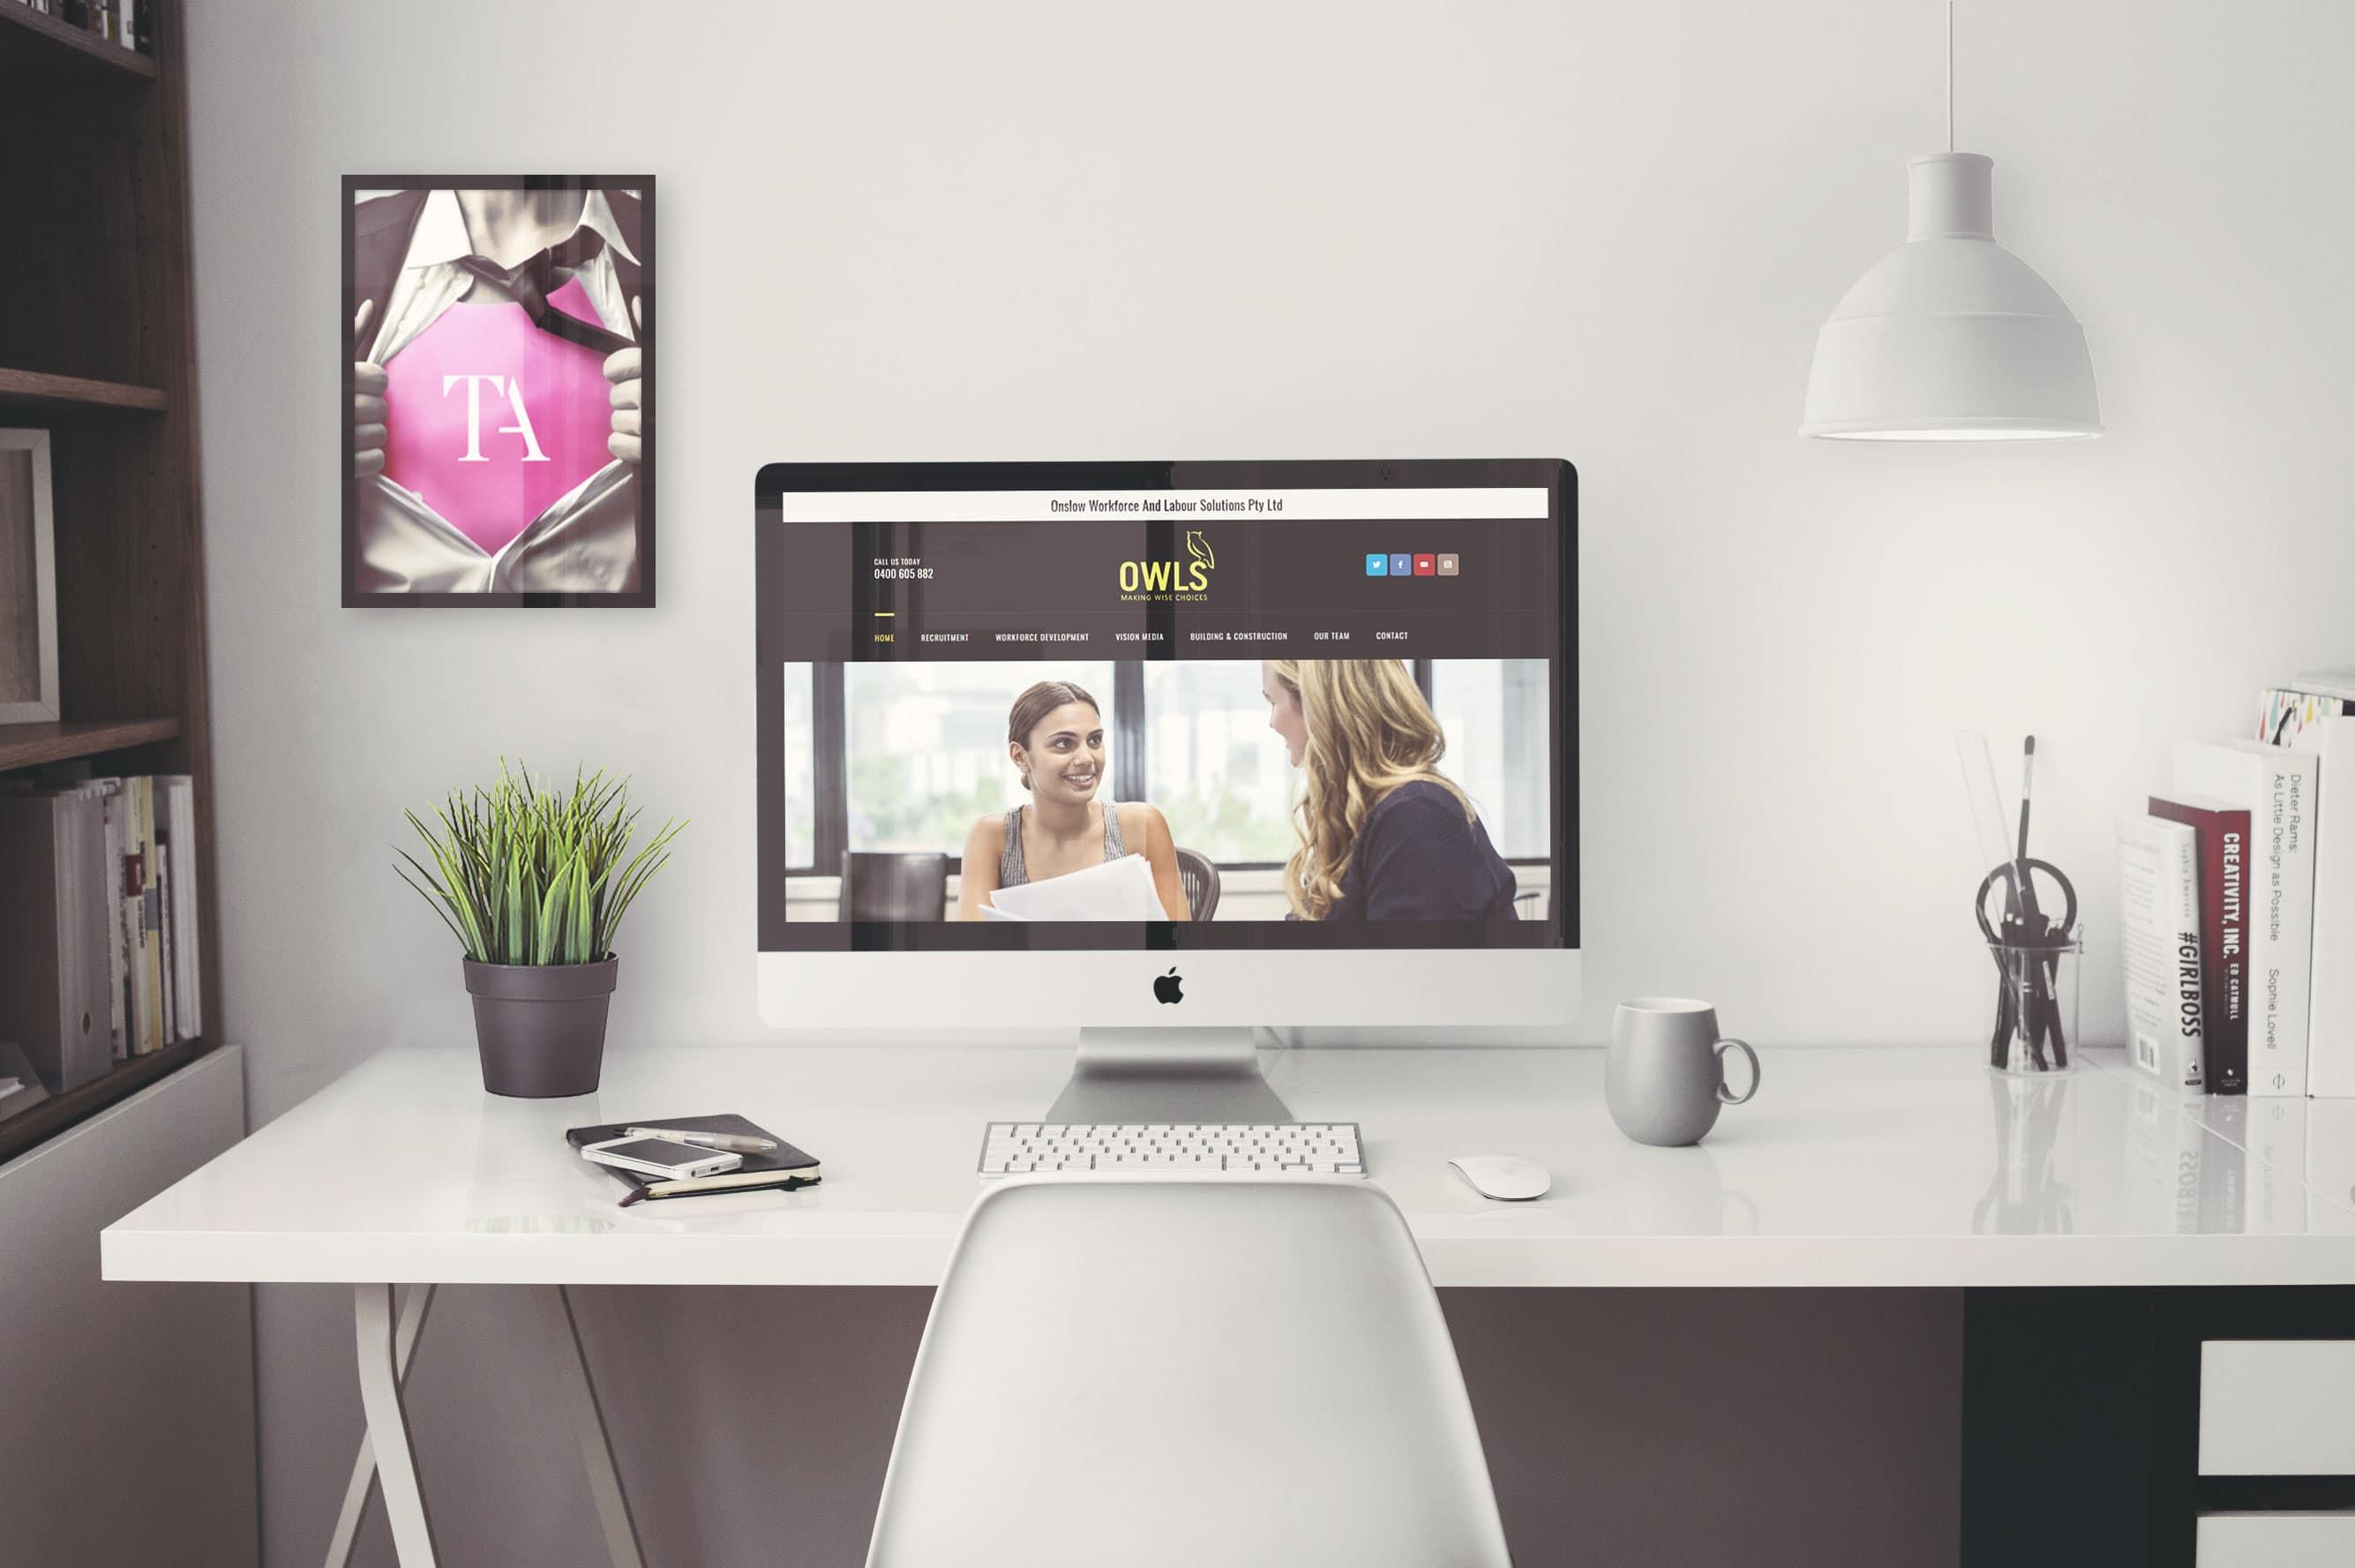 TA Digital Brisbane Website Design and Development – OWLS